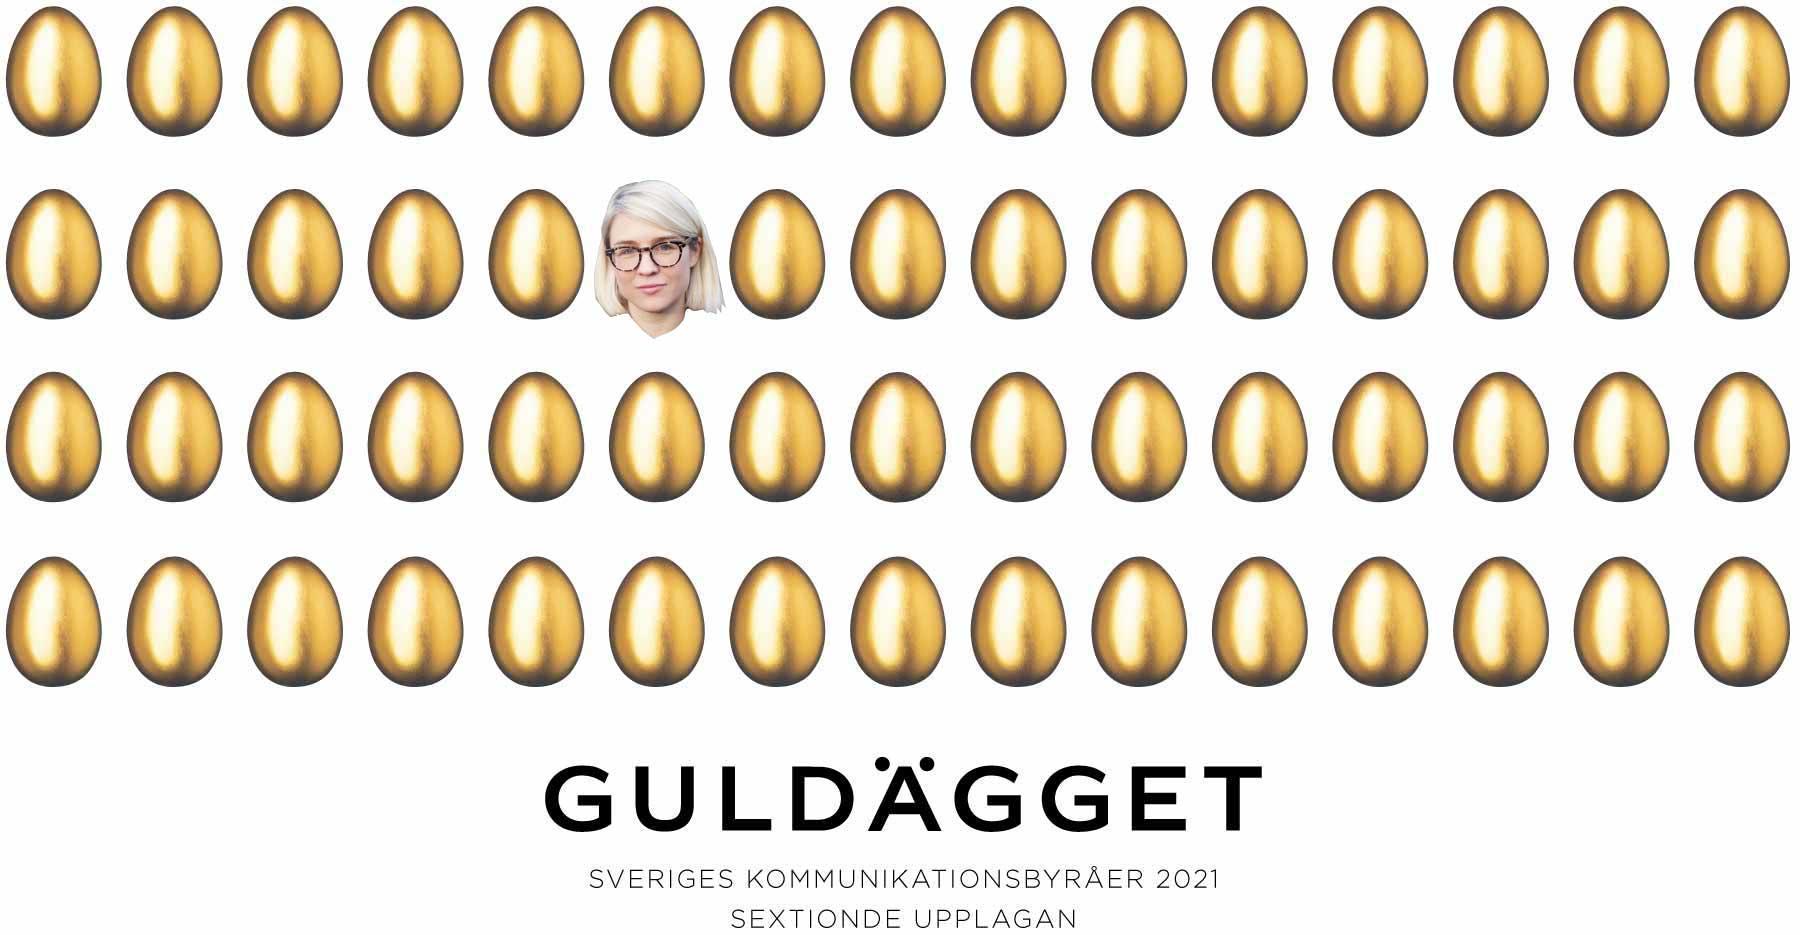 Guldägget partnership Ebba Grenninger